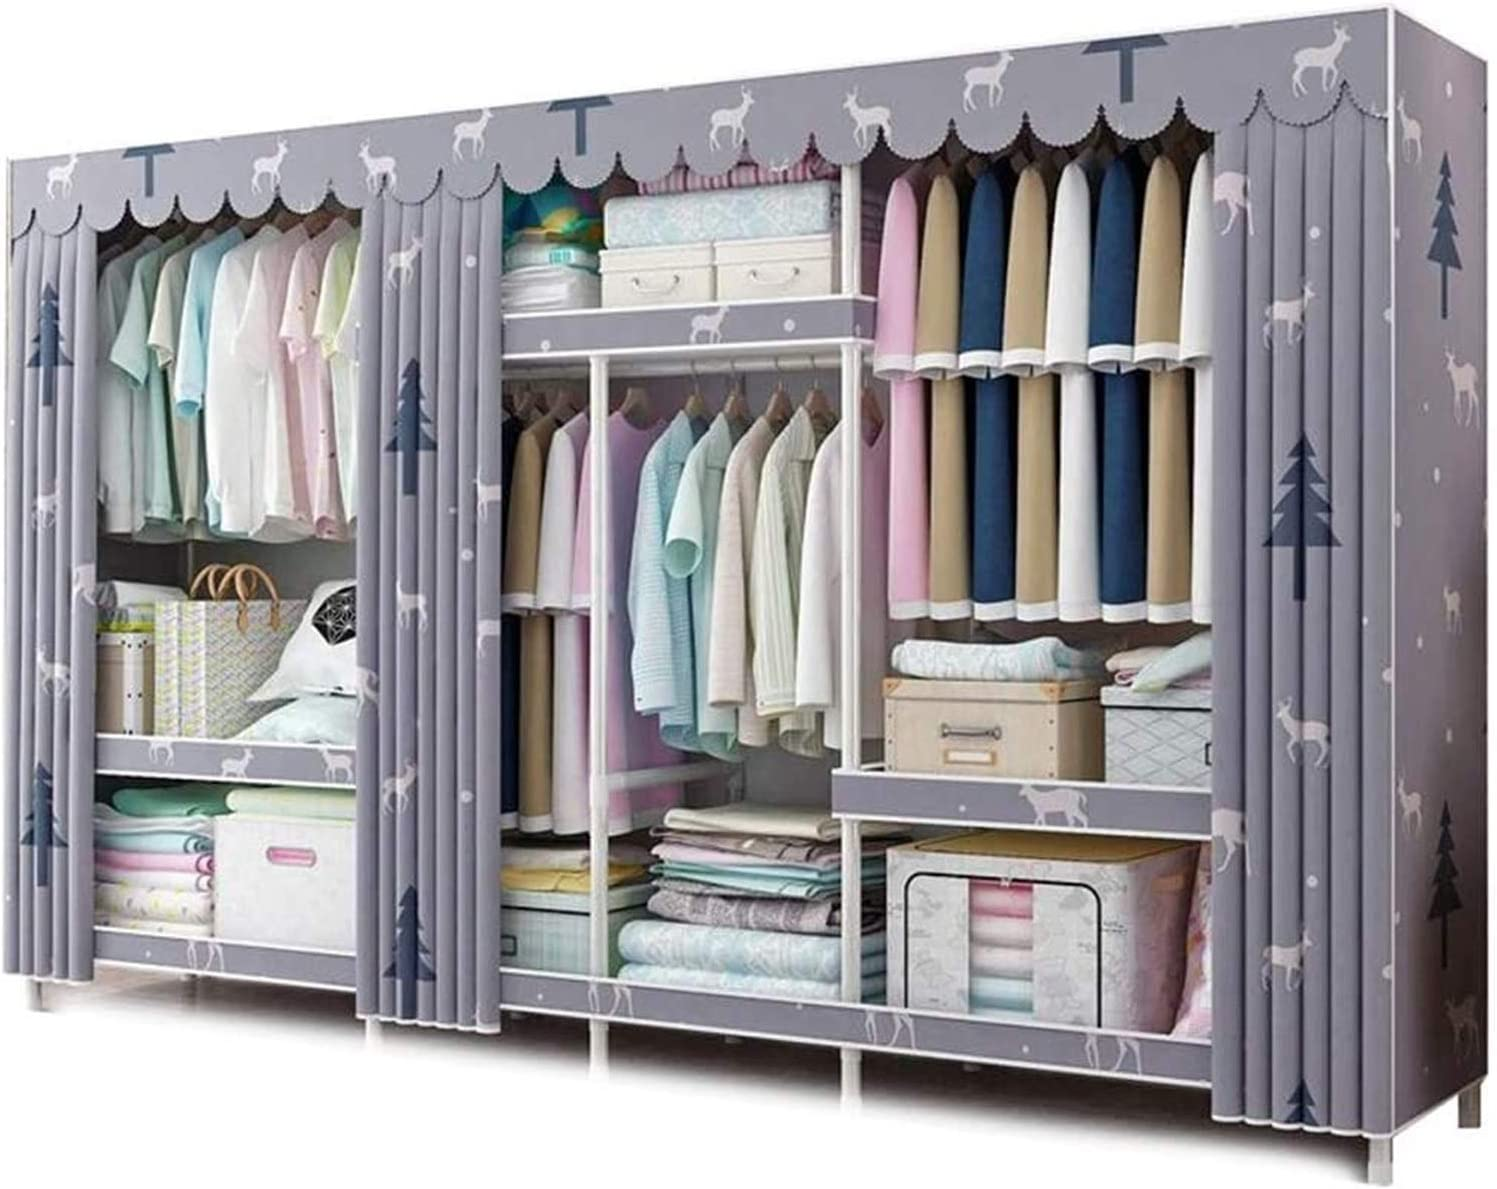 LLCY Portable Closet Wardrobe Special price Challenge the lowest price Storage Organizer Clothes